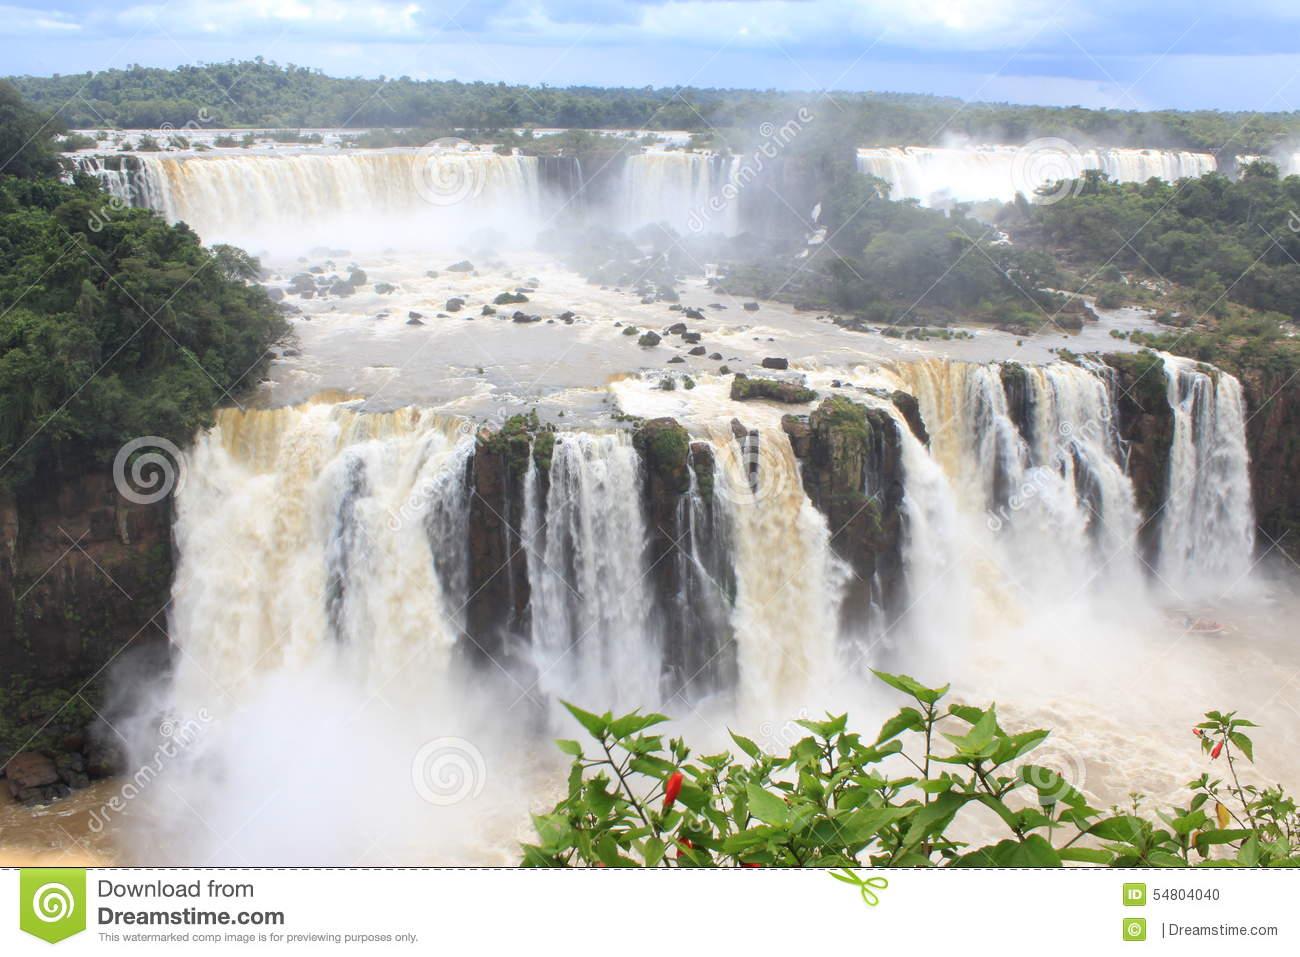 Iguazu Falls clipart #4, Download drawings